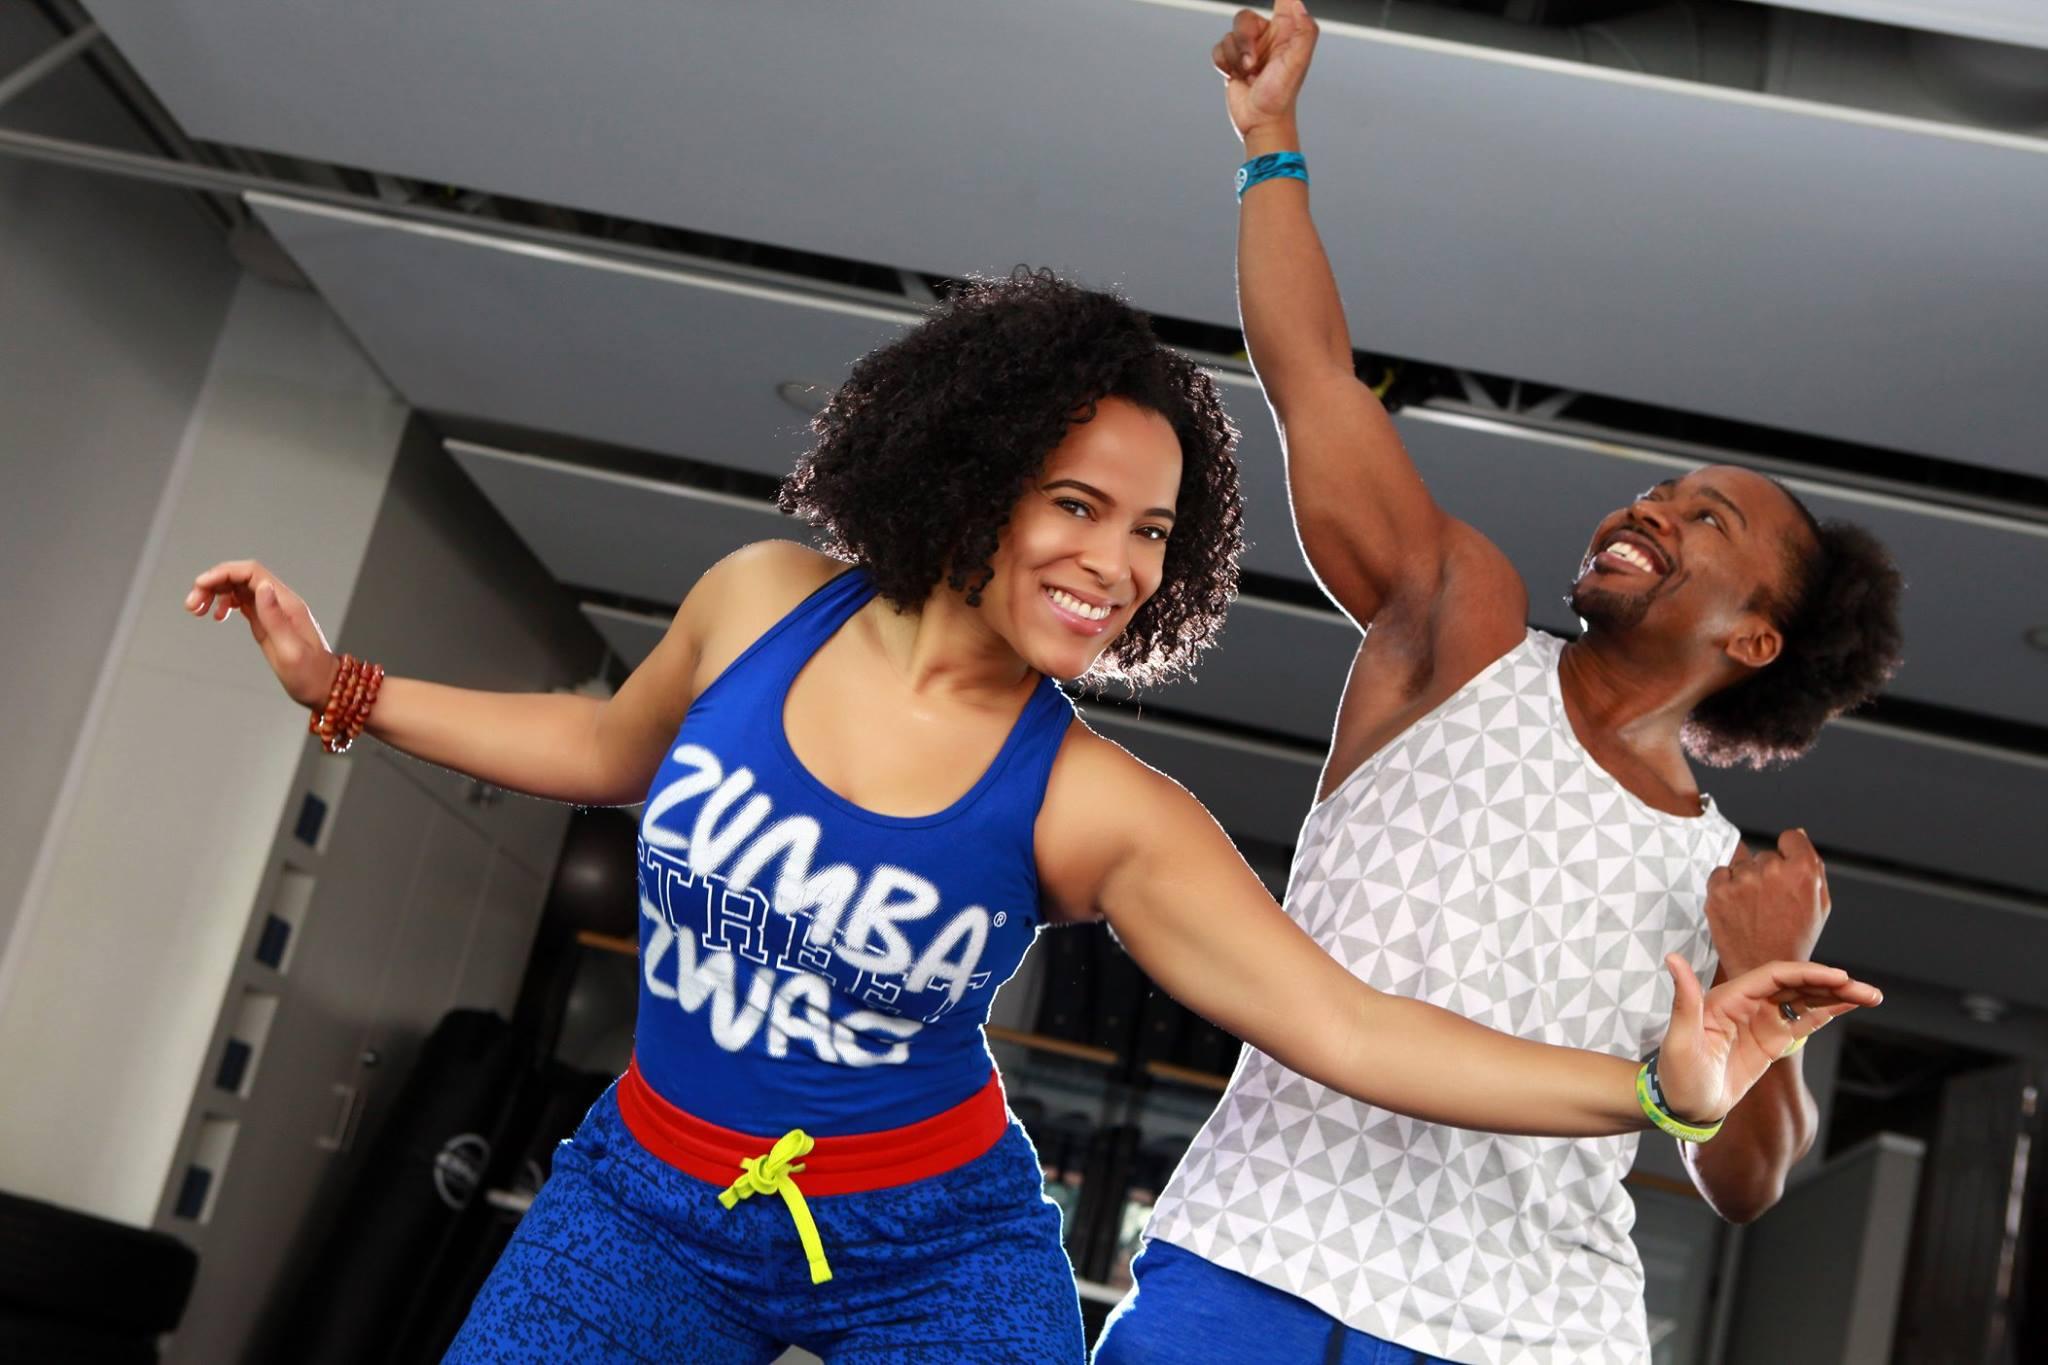 Zumba lizy zumba fitness classes victoria bc for Mirror zumba